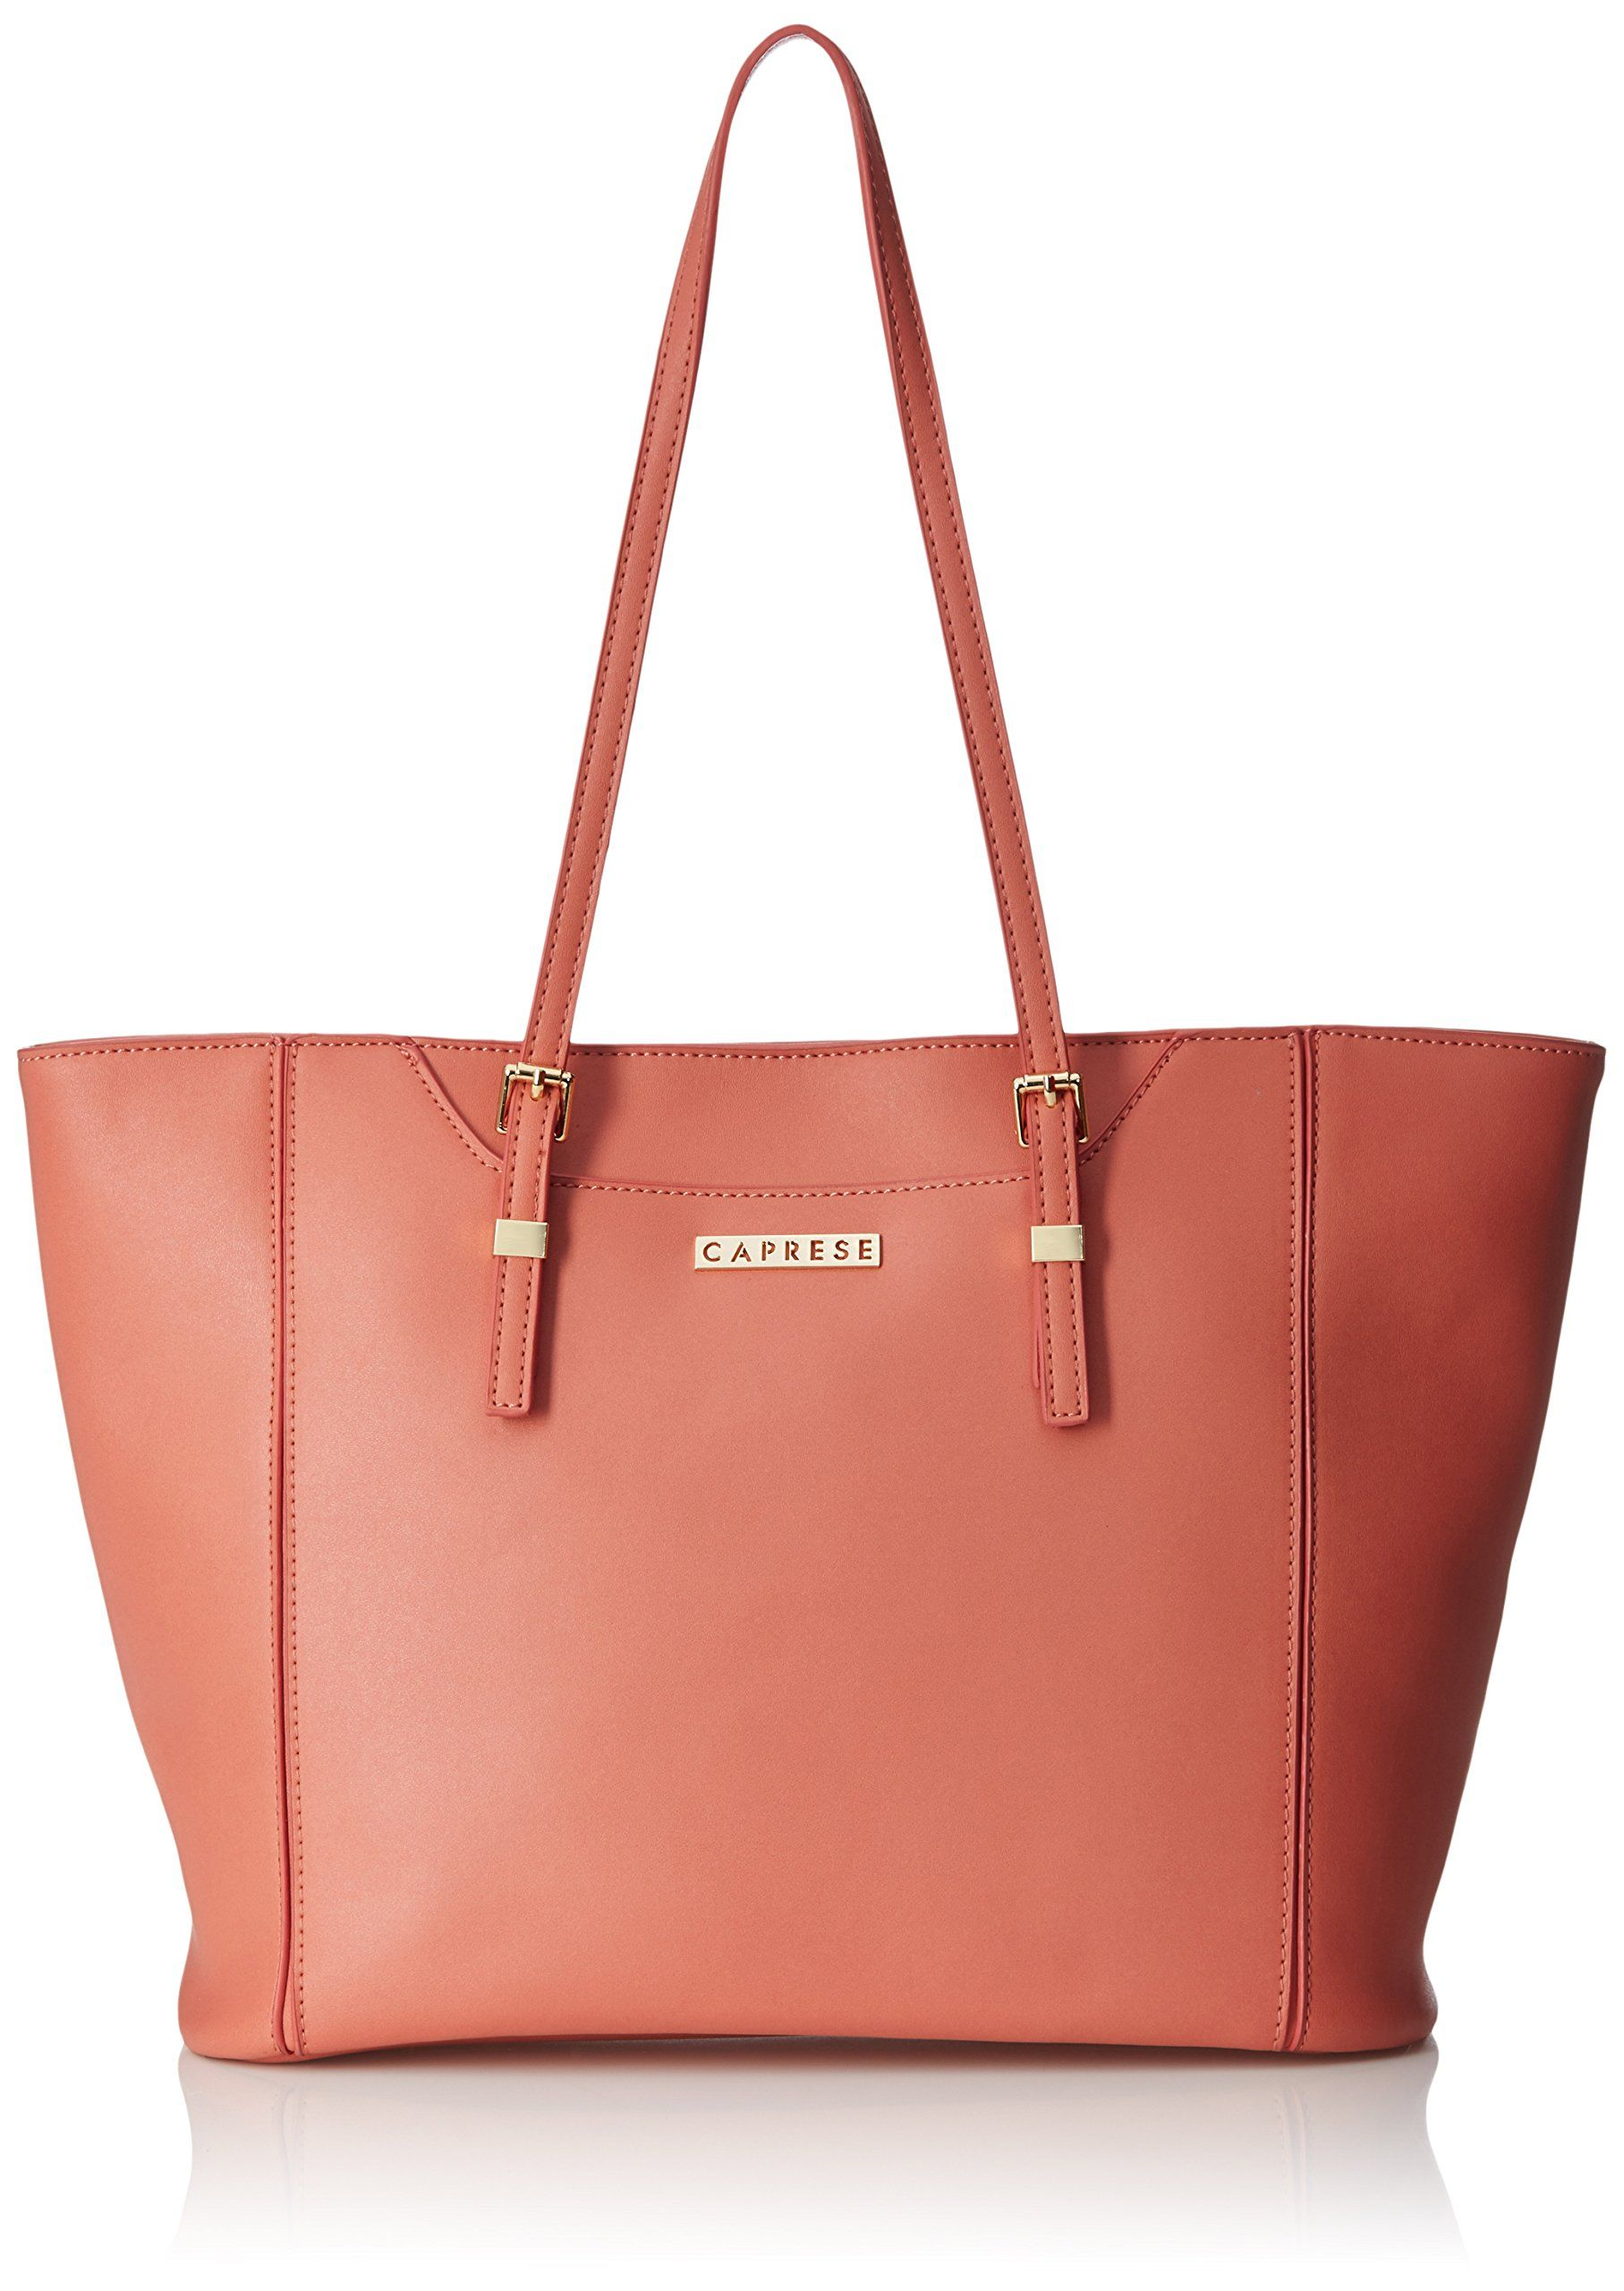 26e3d01564dd Caprese Jessica Women's Tote Bag (Dusty Coral) - | 2024.00 | Women ...